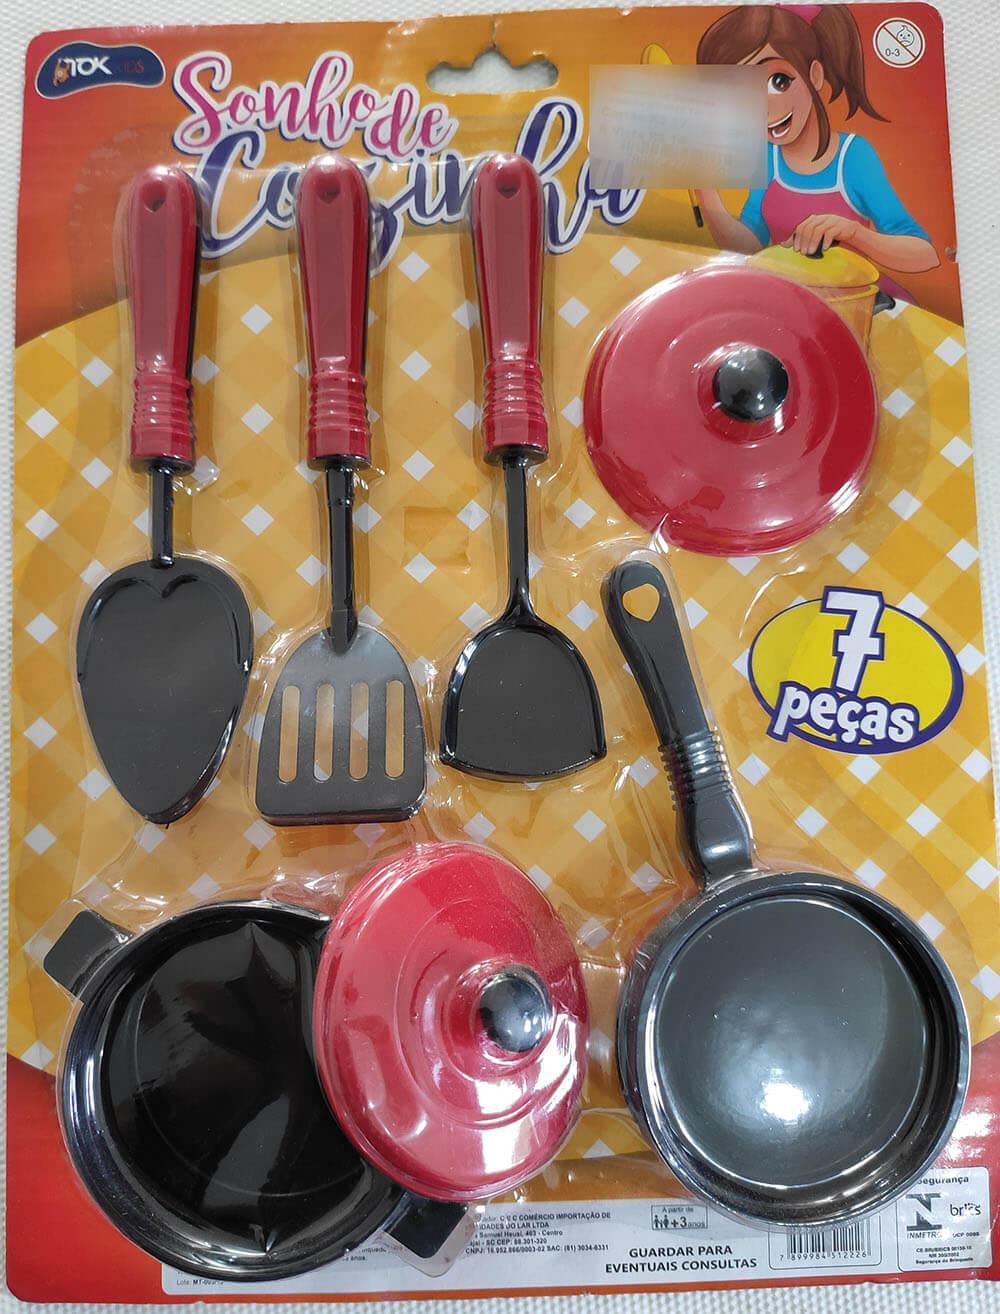 Brinquedo kit Sonho de Cozinha MT-0620 Tok Kids